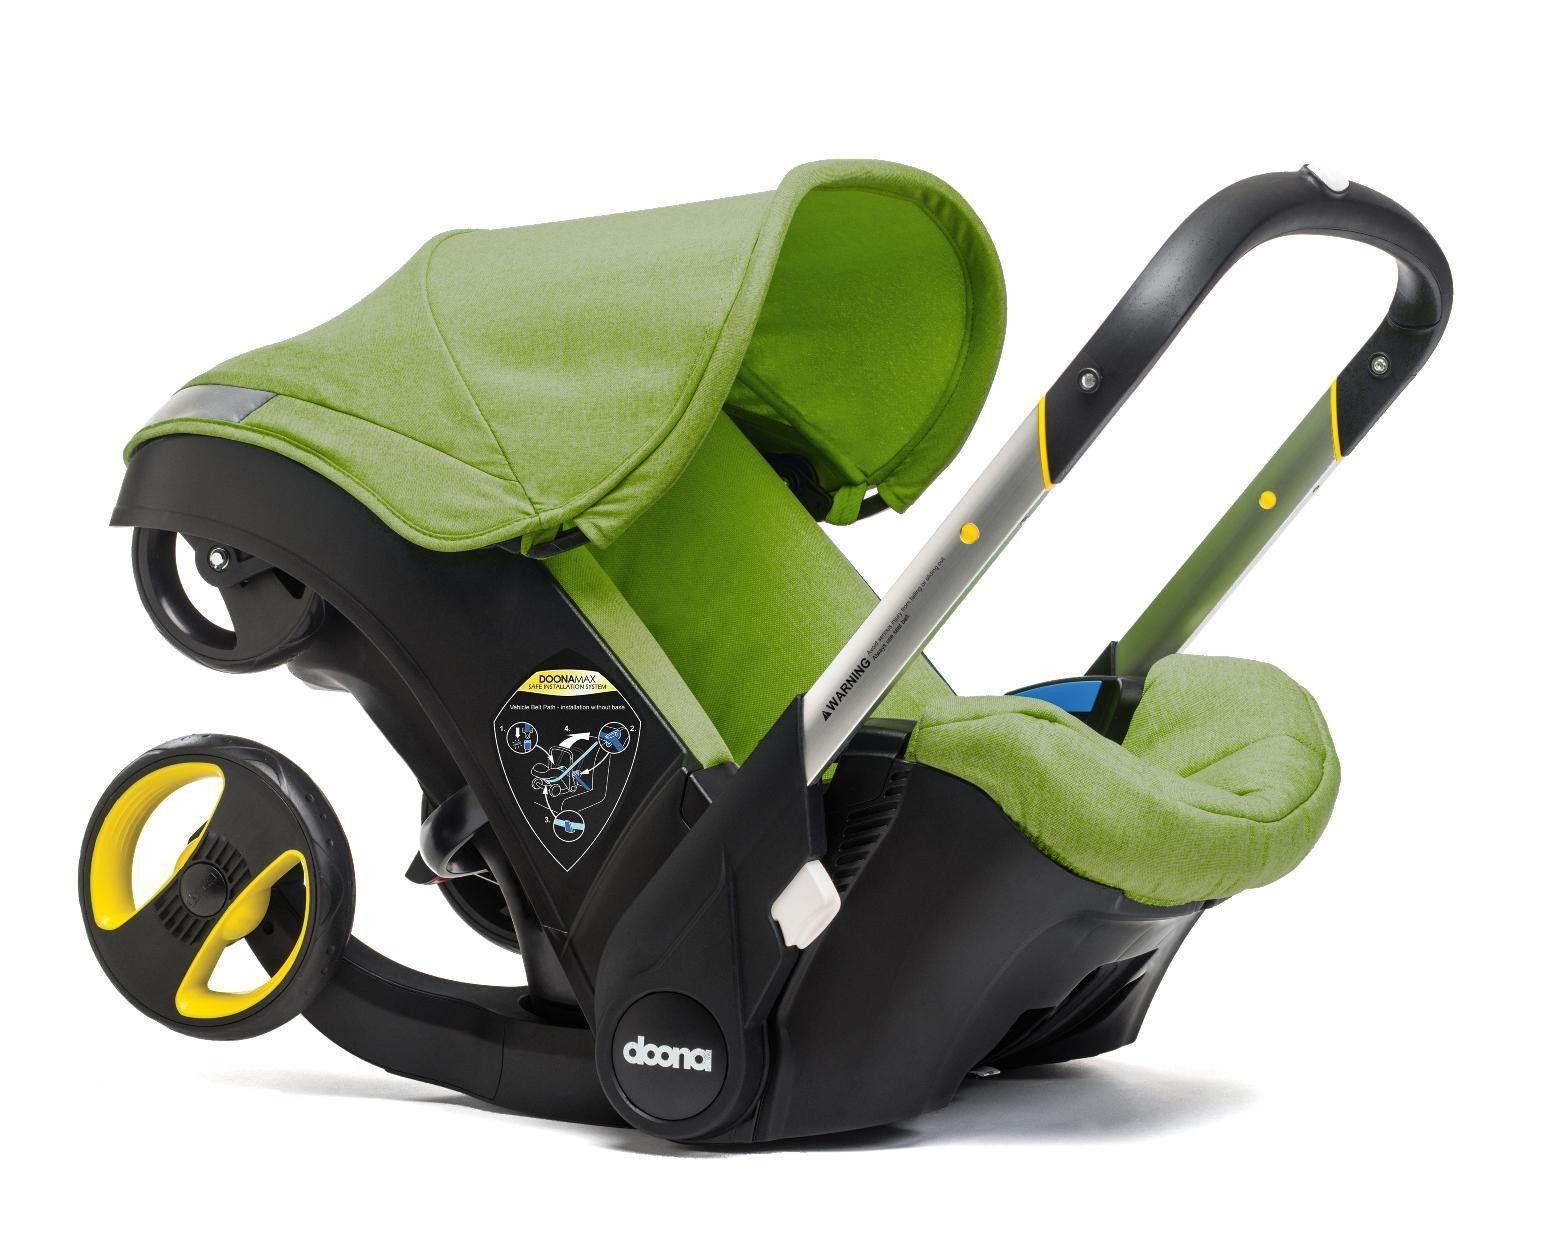 Doona Car Seat Stroller Car seats, Baby car seats, Doona